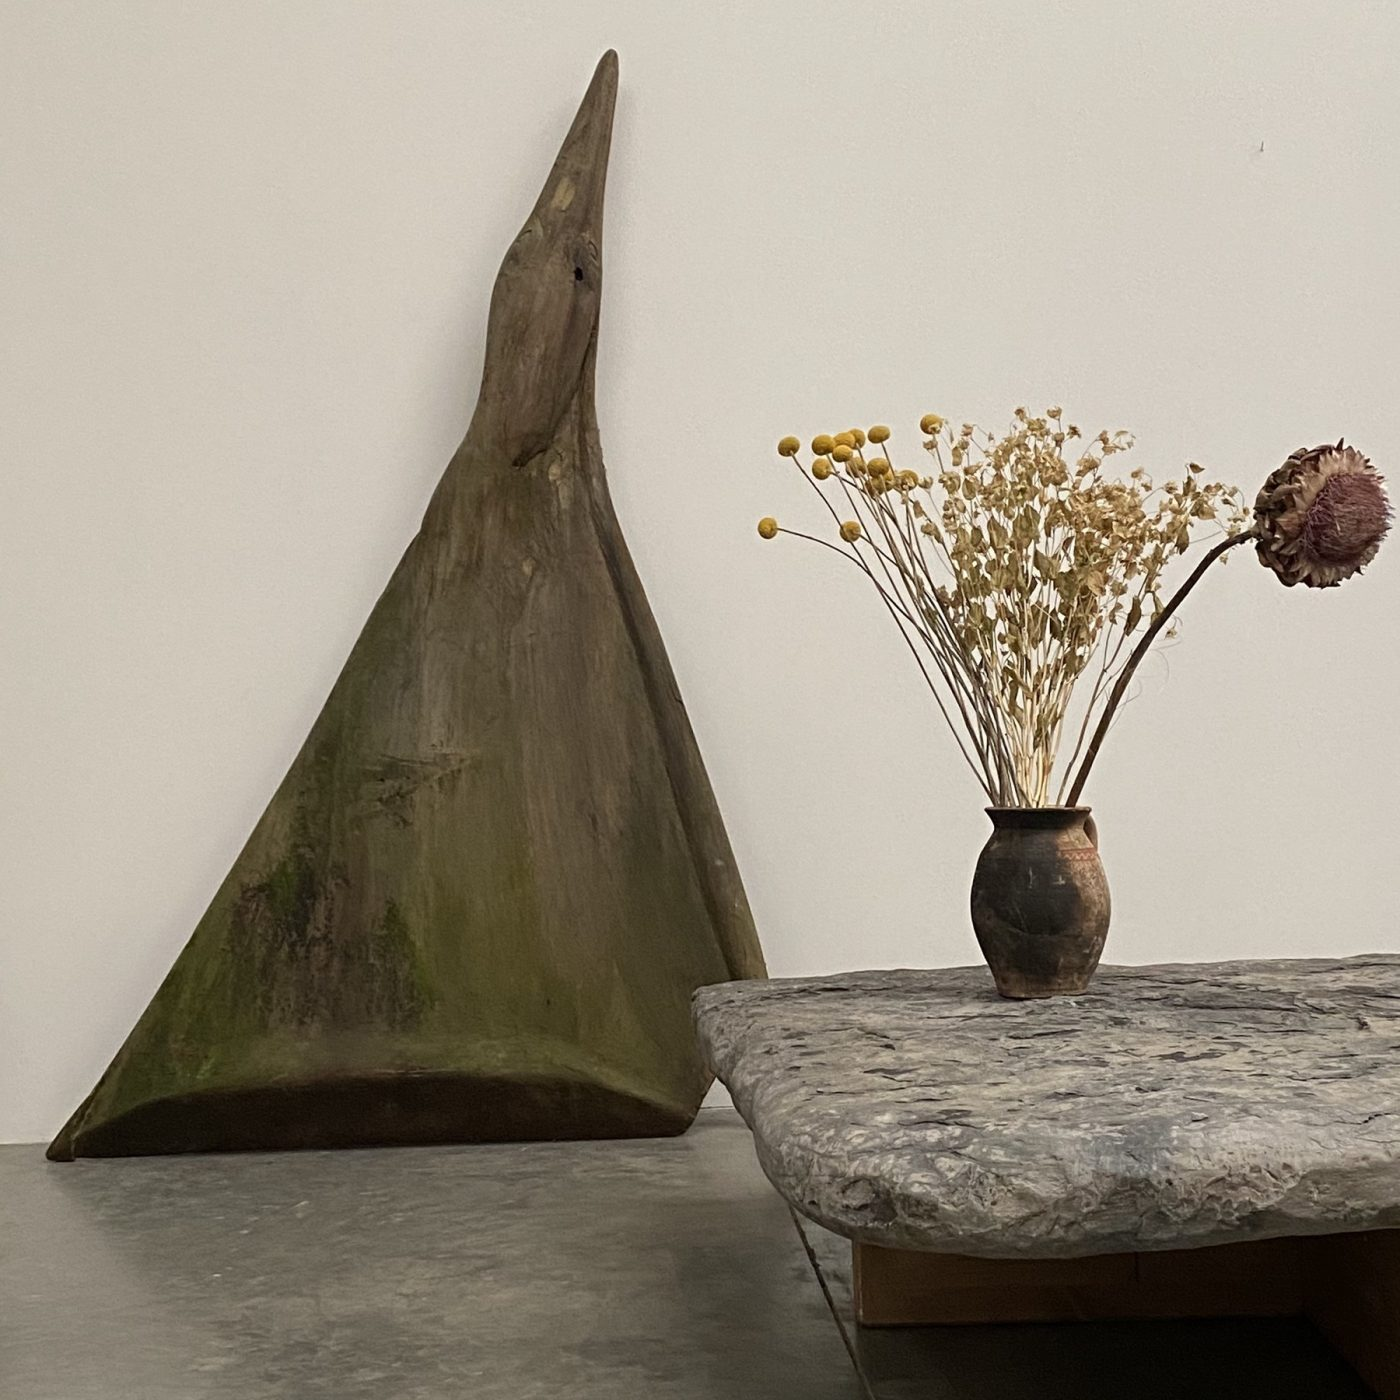 objet-vagabond-wooden-sculpture0000